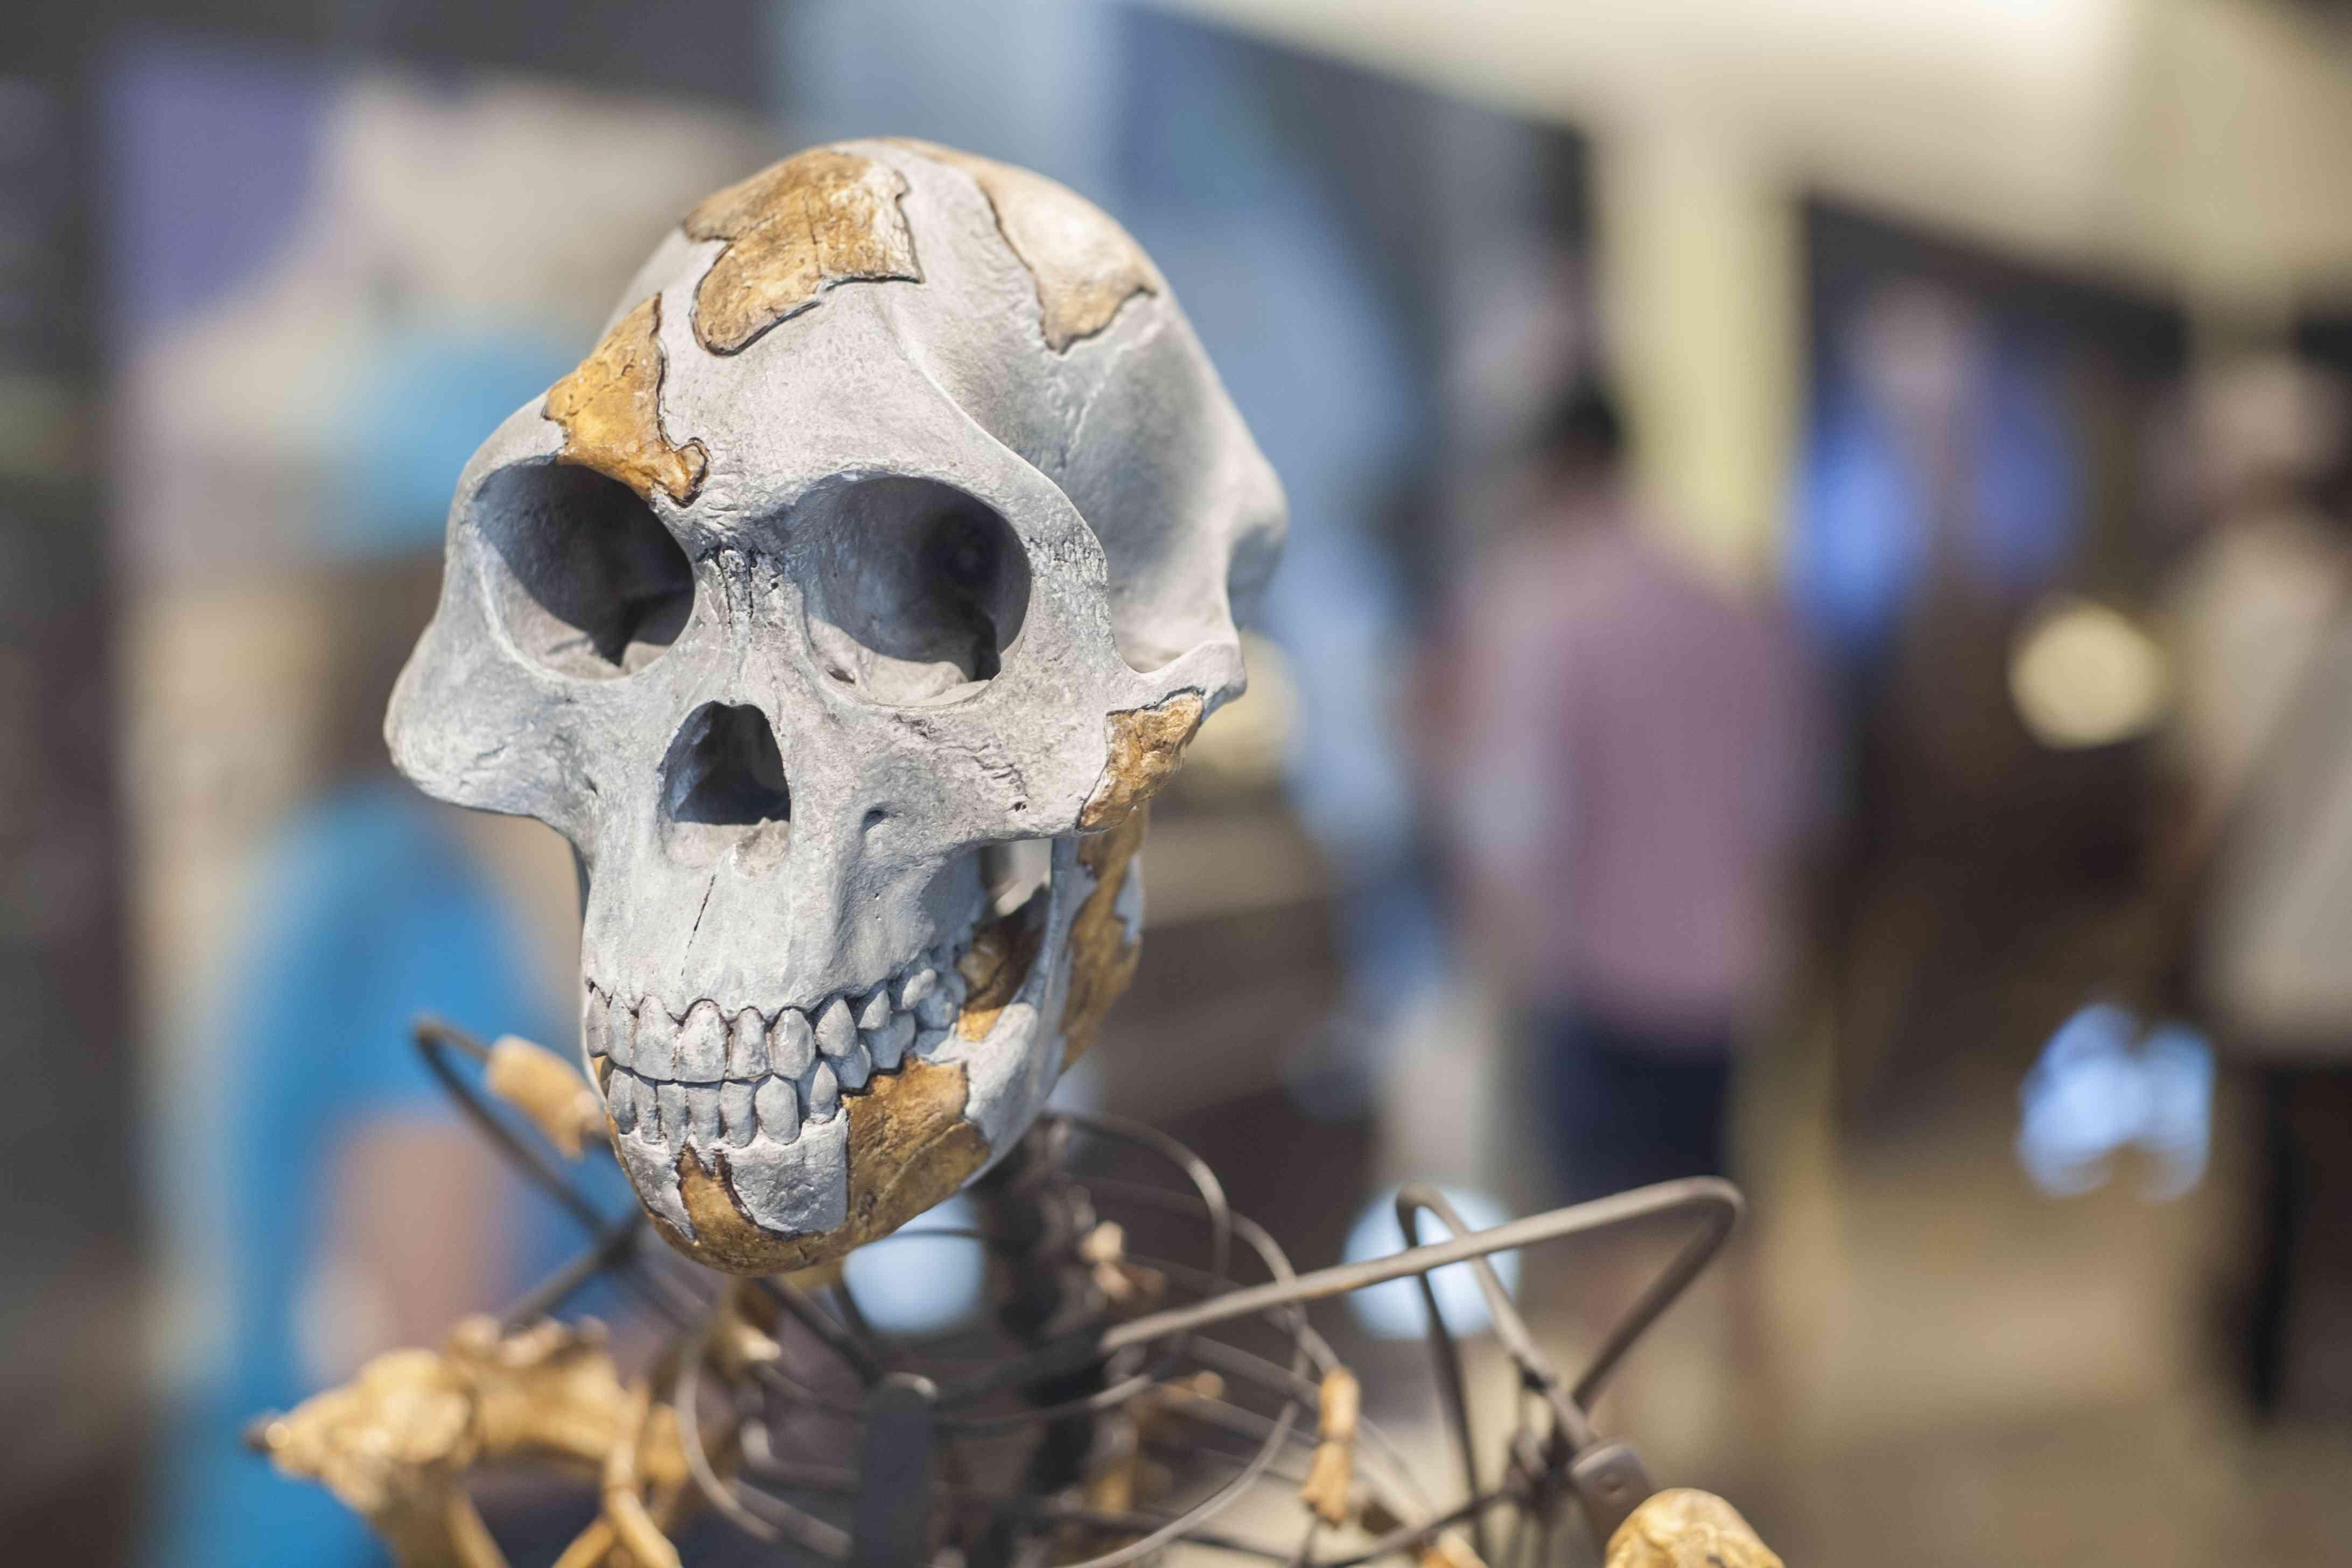 skull and skeleton of Lucy, Australopithecus afarensis